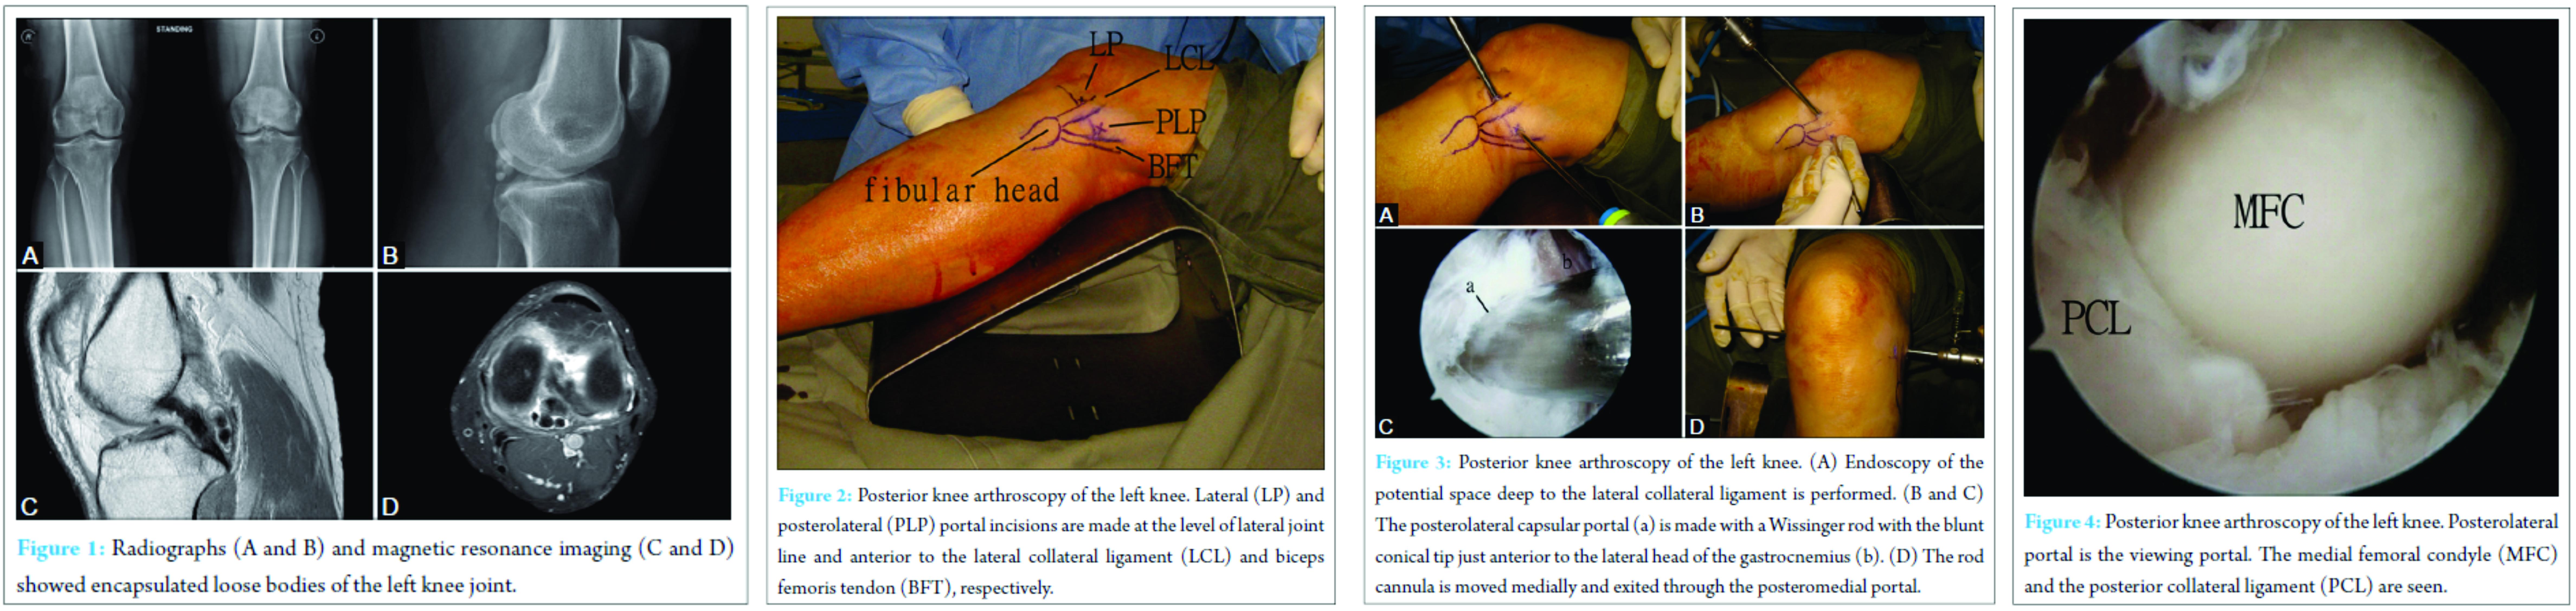 Posterior Knee Loose Bodies Treated By Posterior Knee Arthroscopy